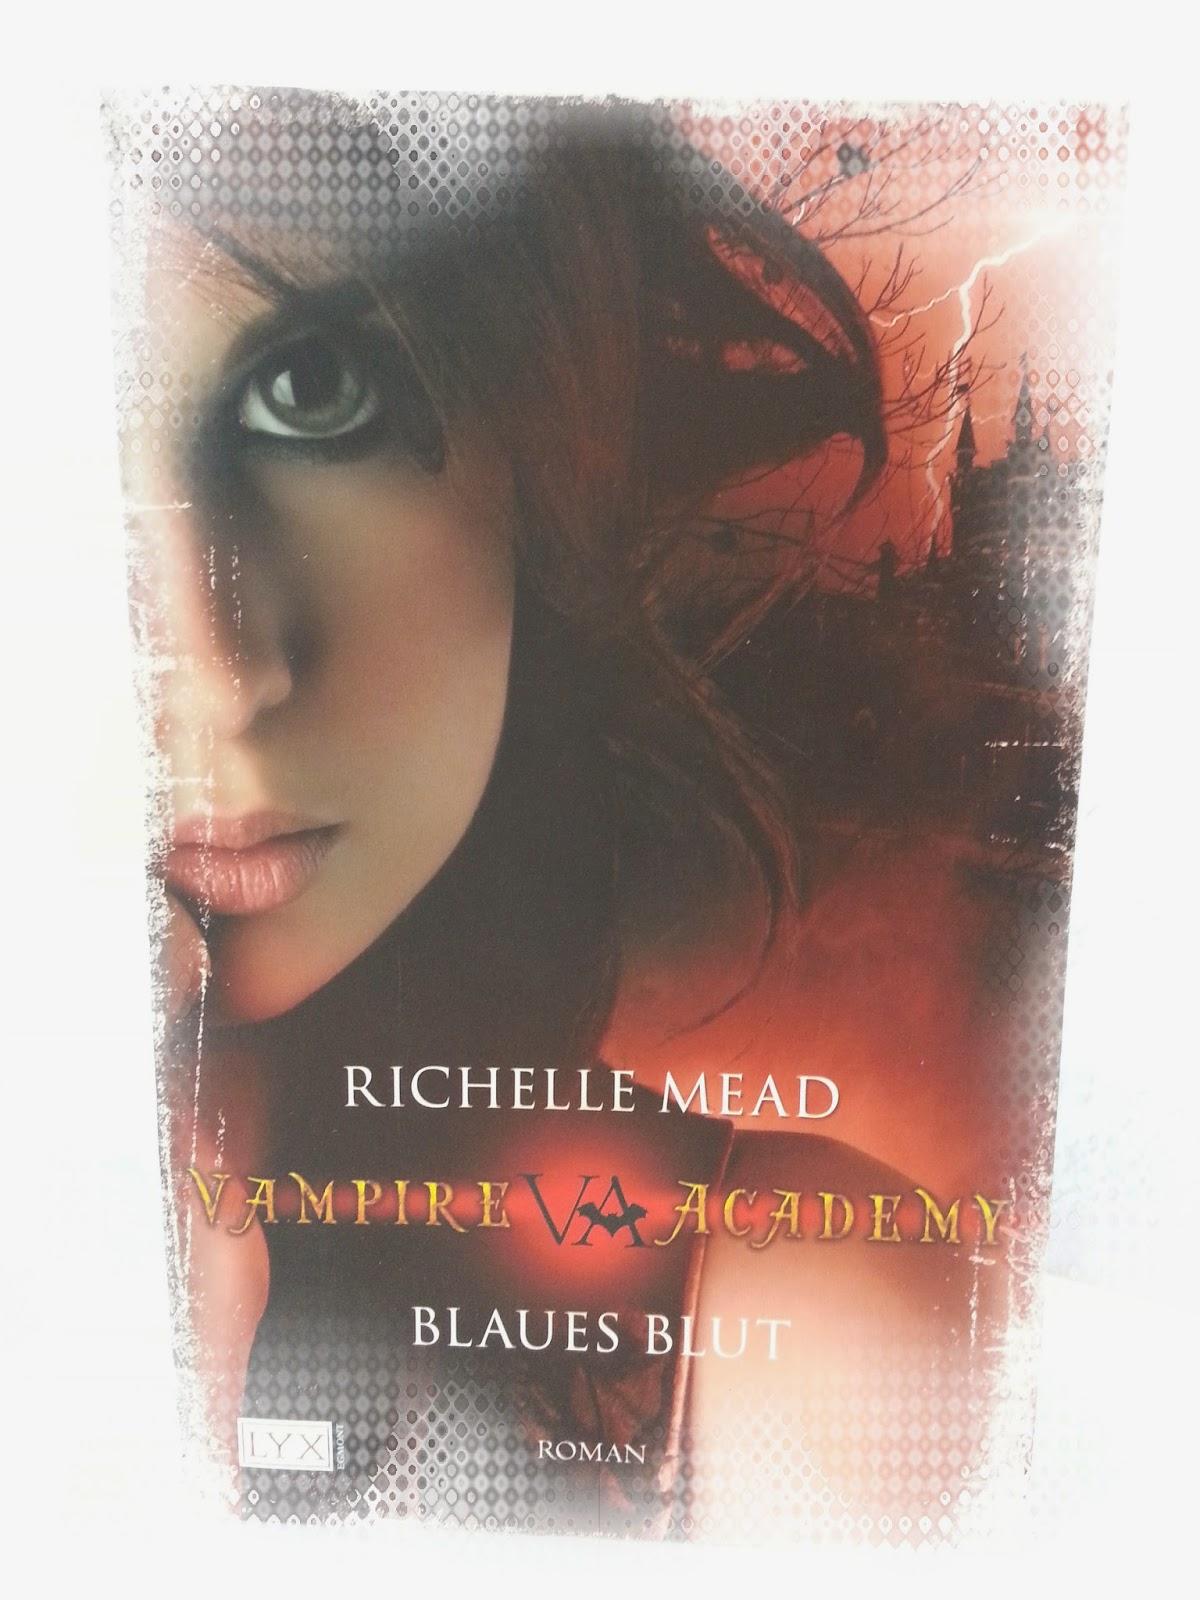 http://www.amazon.de/Vampire-Academy-Blaues-Richelle-Mead/dp/3802582020/ref=sr_1_2_bnp_1_har?s=books&ie=UTF8&qid=1399922792&sr=1-2&keywords=vampire+academy